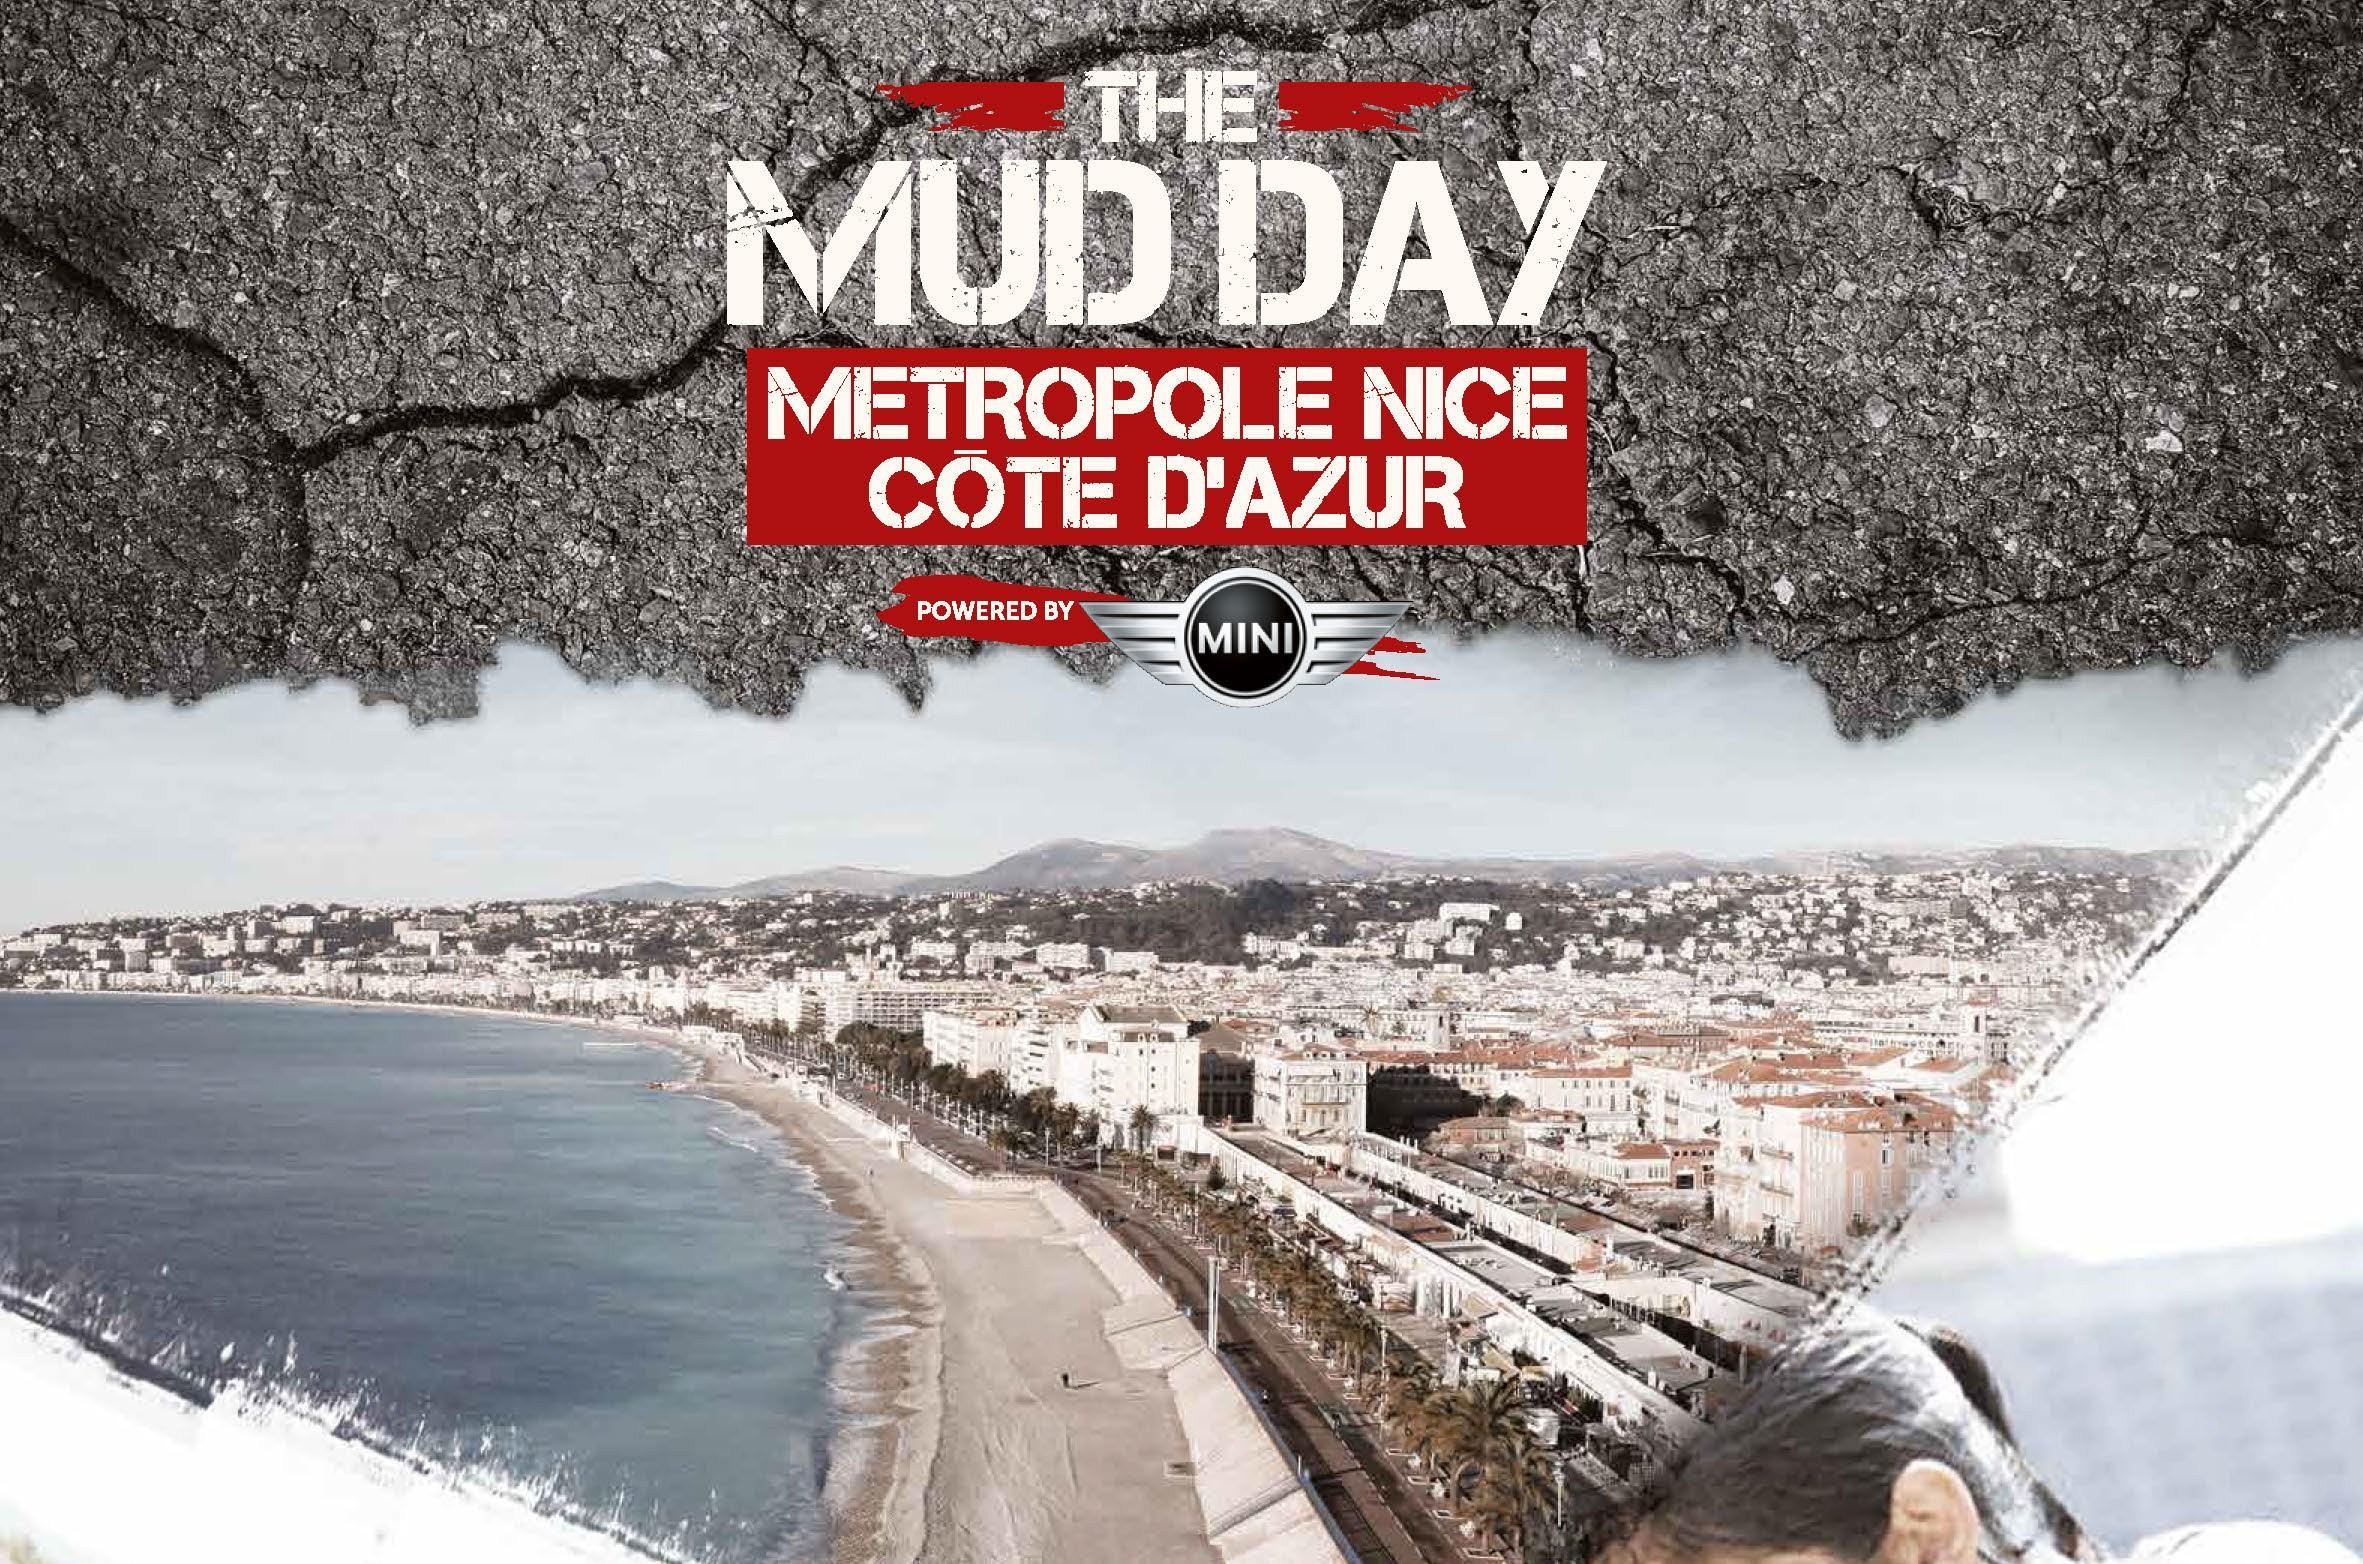 mud-day-nice-cote-dazur